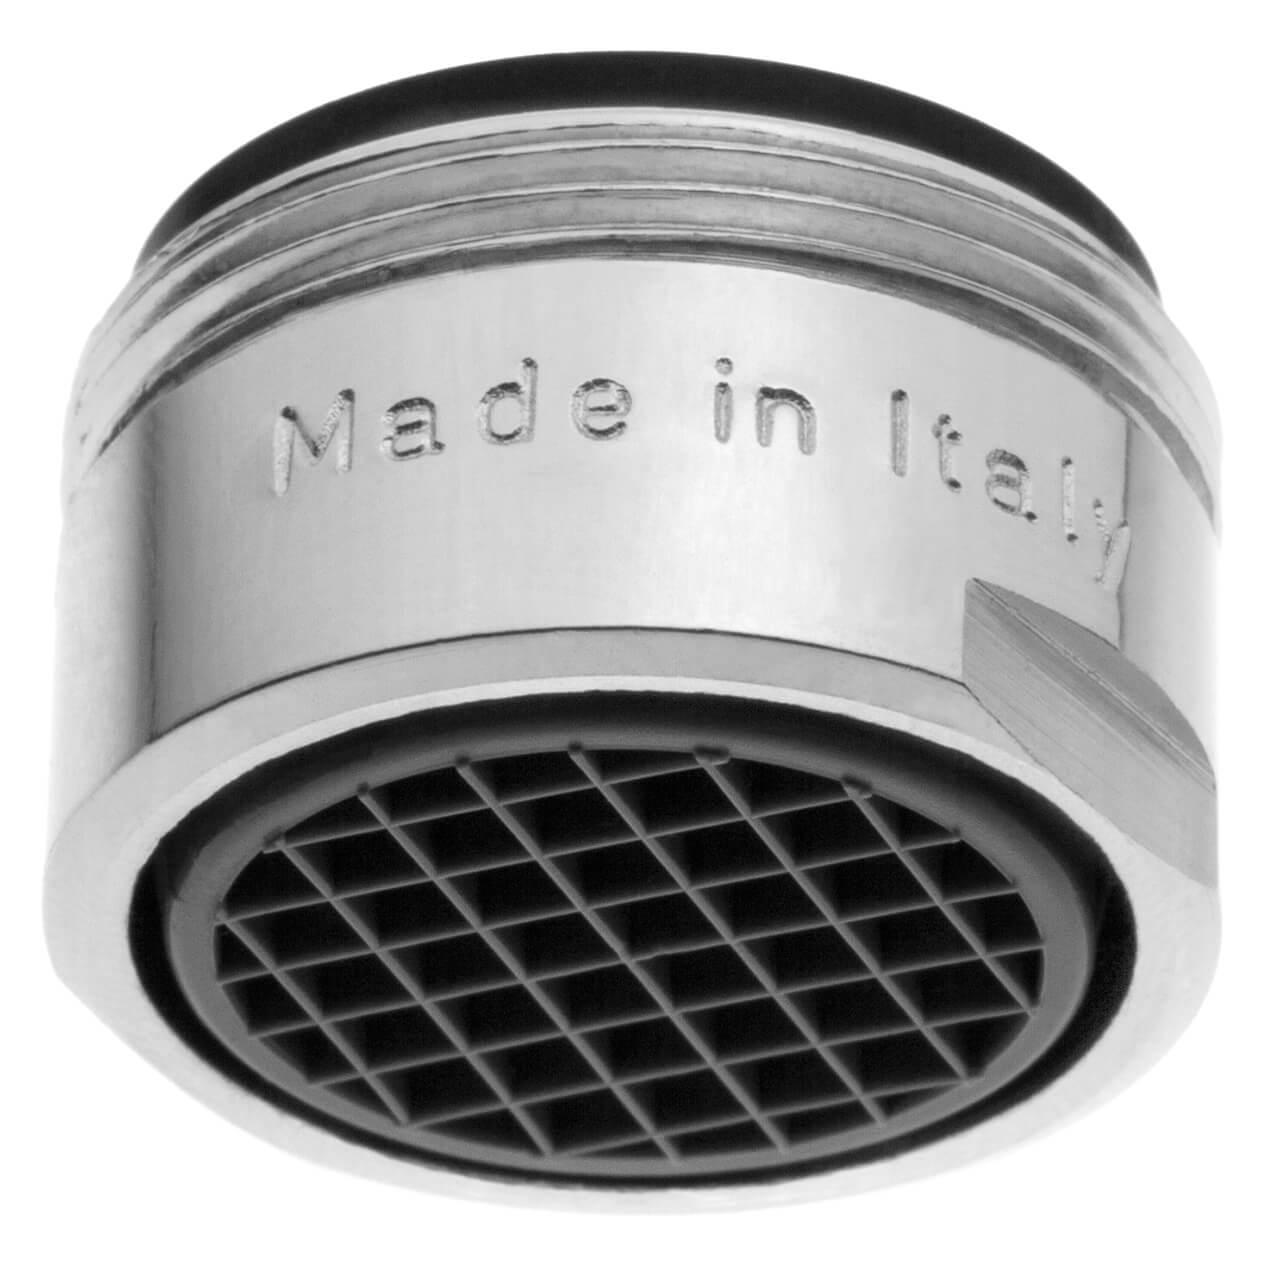 Tap aerator Terla FreeLime 1.7 l/min - Thread M24x1 male - most popular